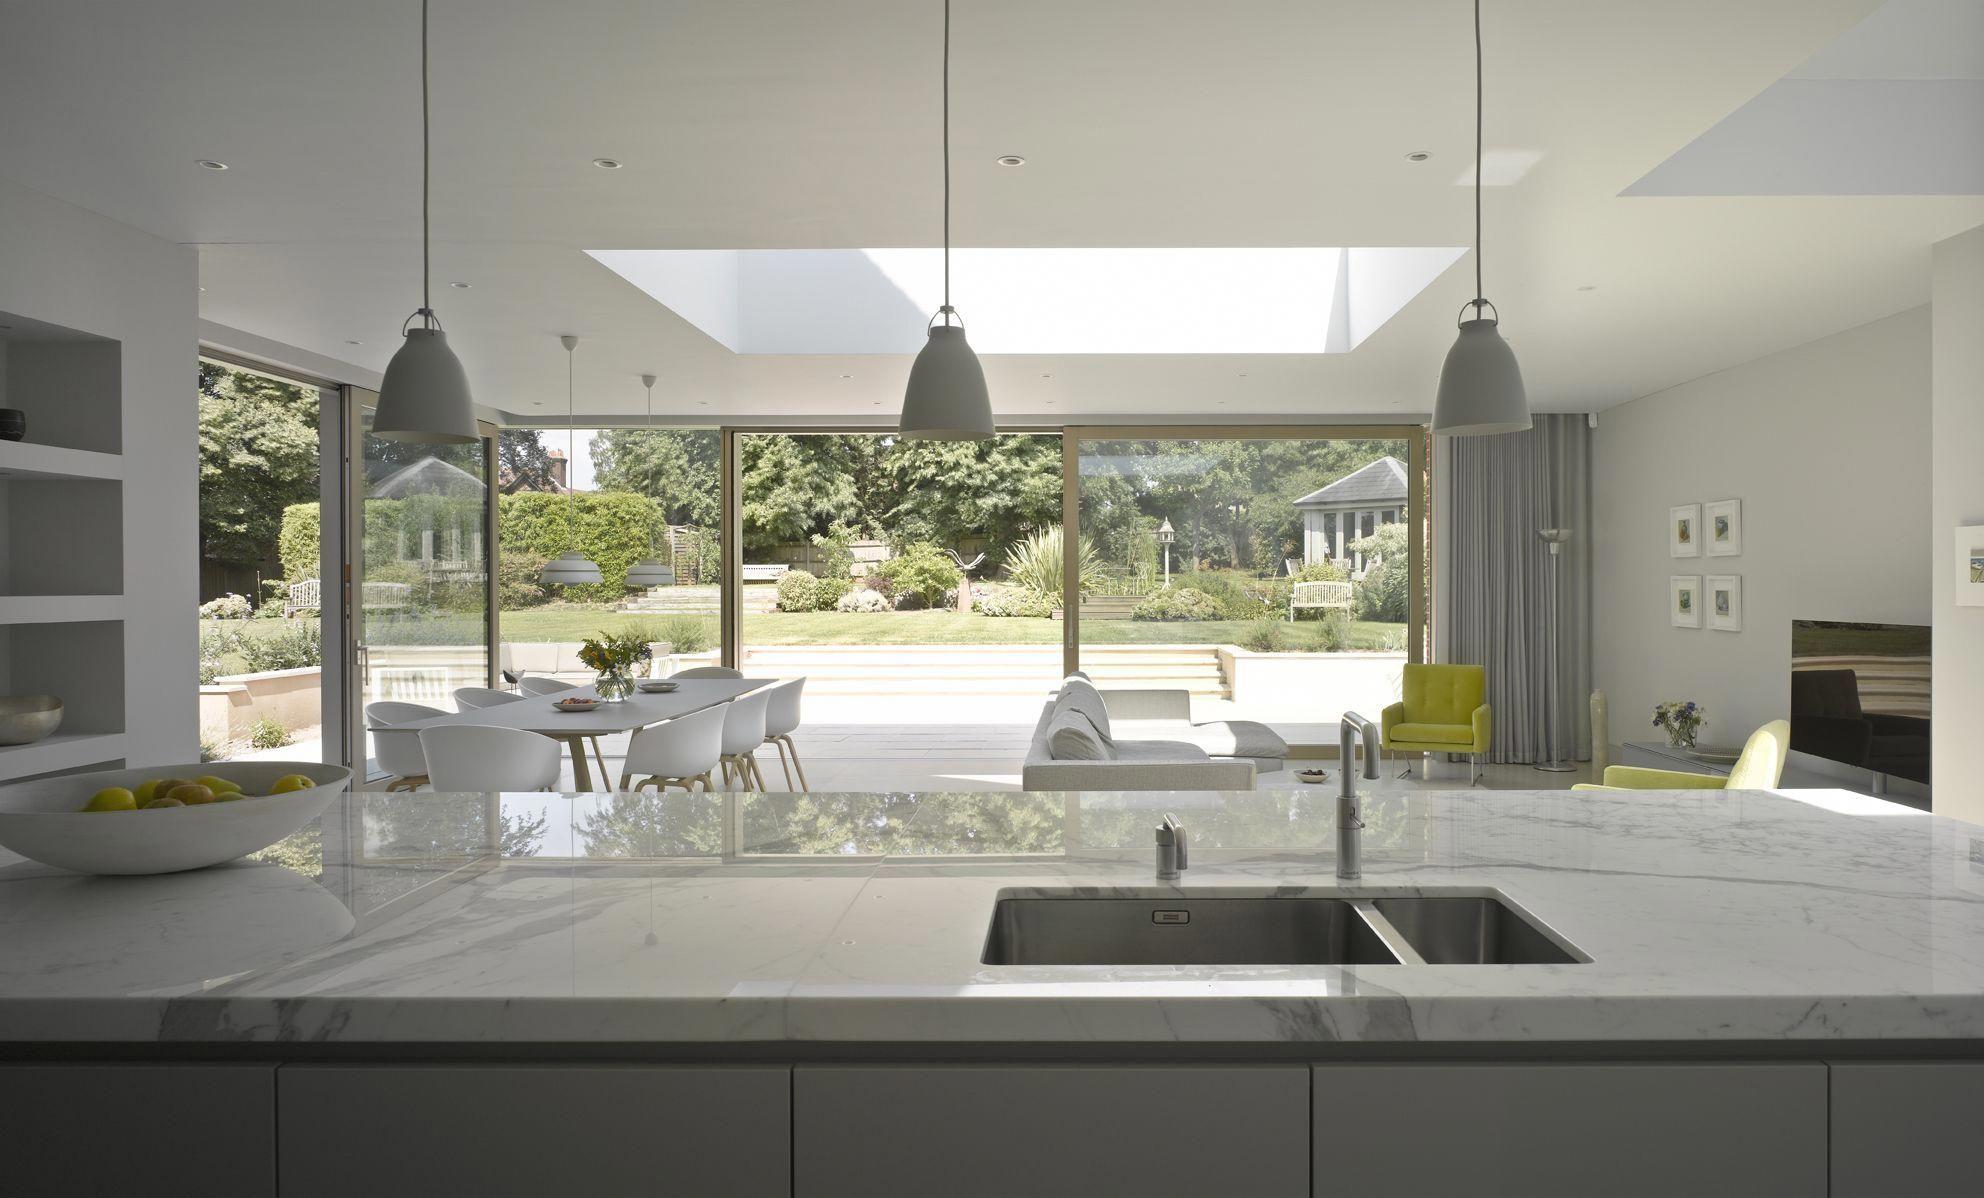 Roundhouse Urbo White Matt Lacquer Bespoke Kitchen Luxurykitchen